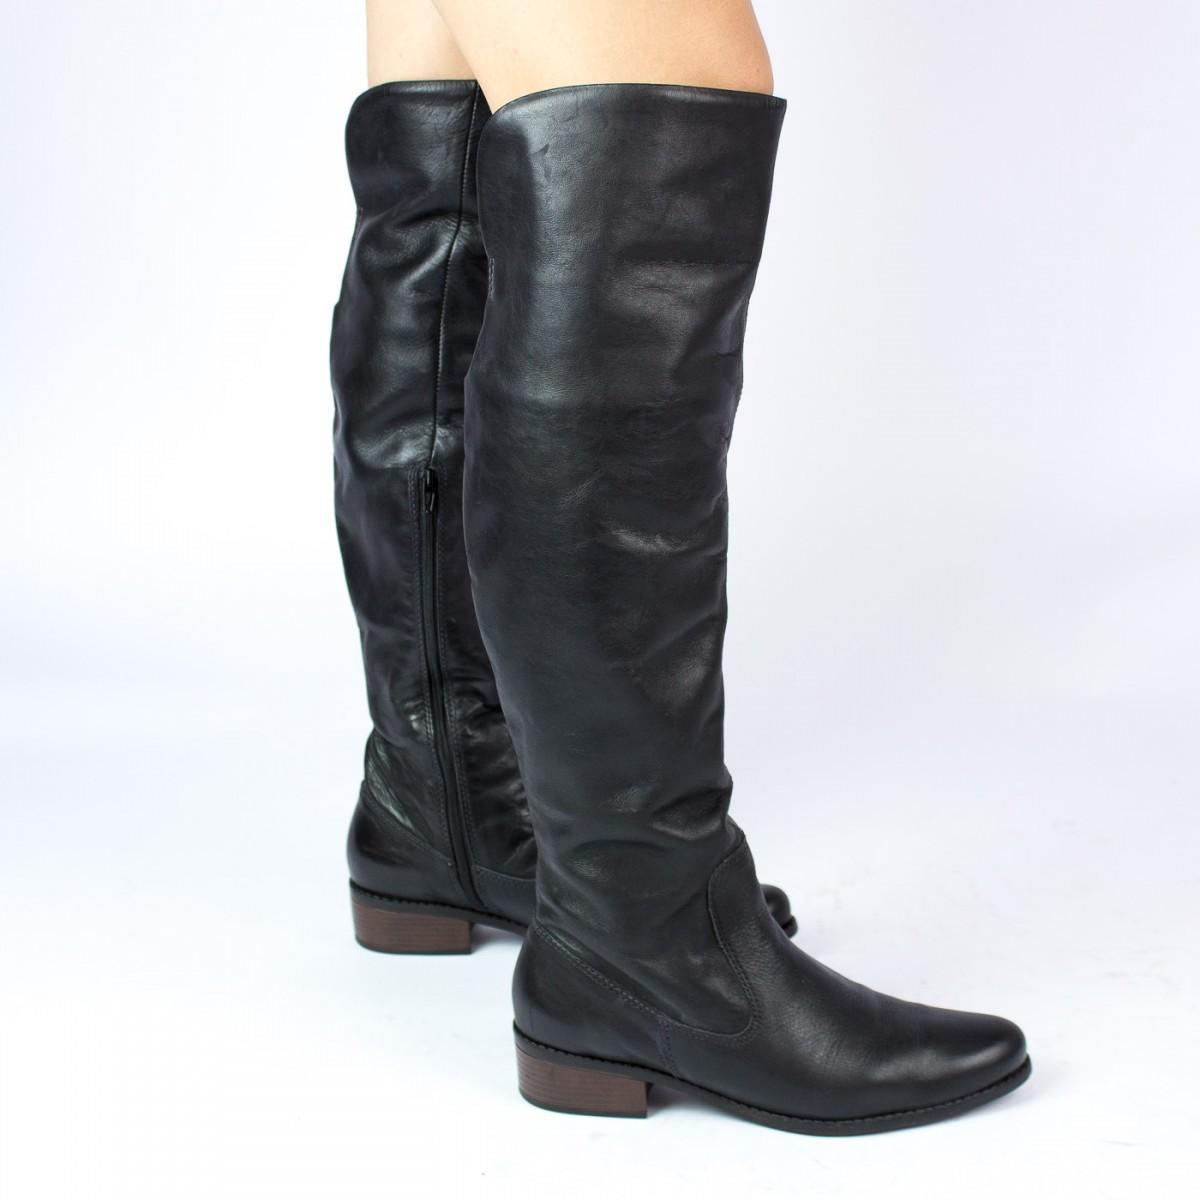 Bizz Store - Bota Bottero Over Knee Couro Natural Feminina Preta a0f6010cd4